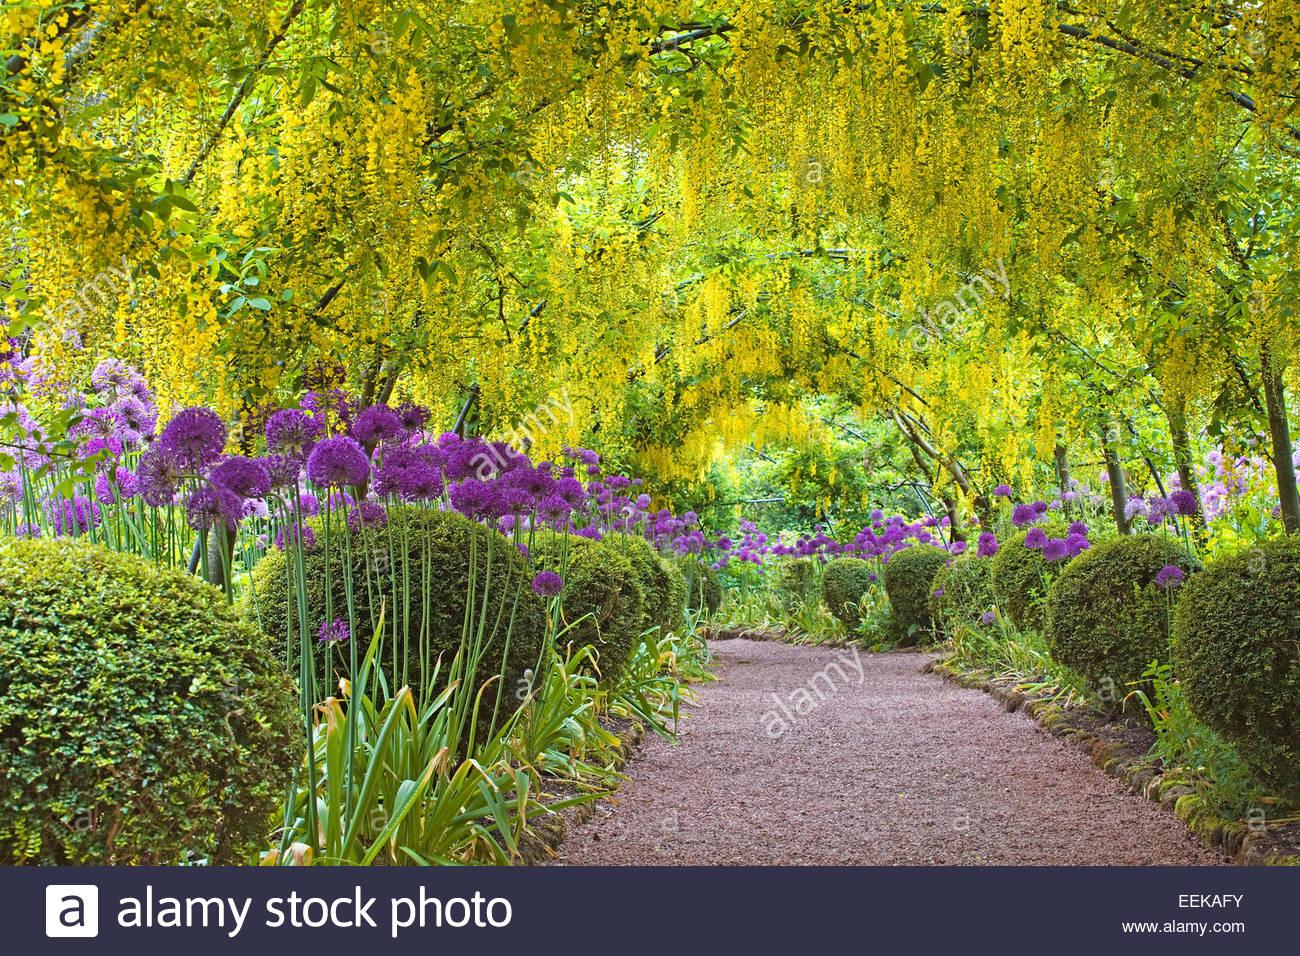 Laburnam arch with Allium borders - Dorothy Clive Gardens - Stock Image